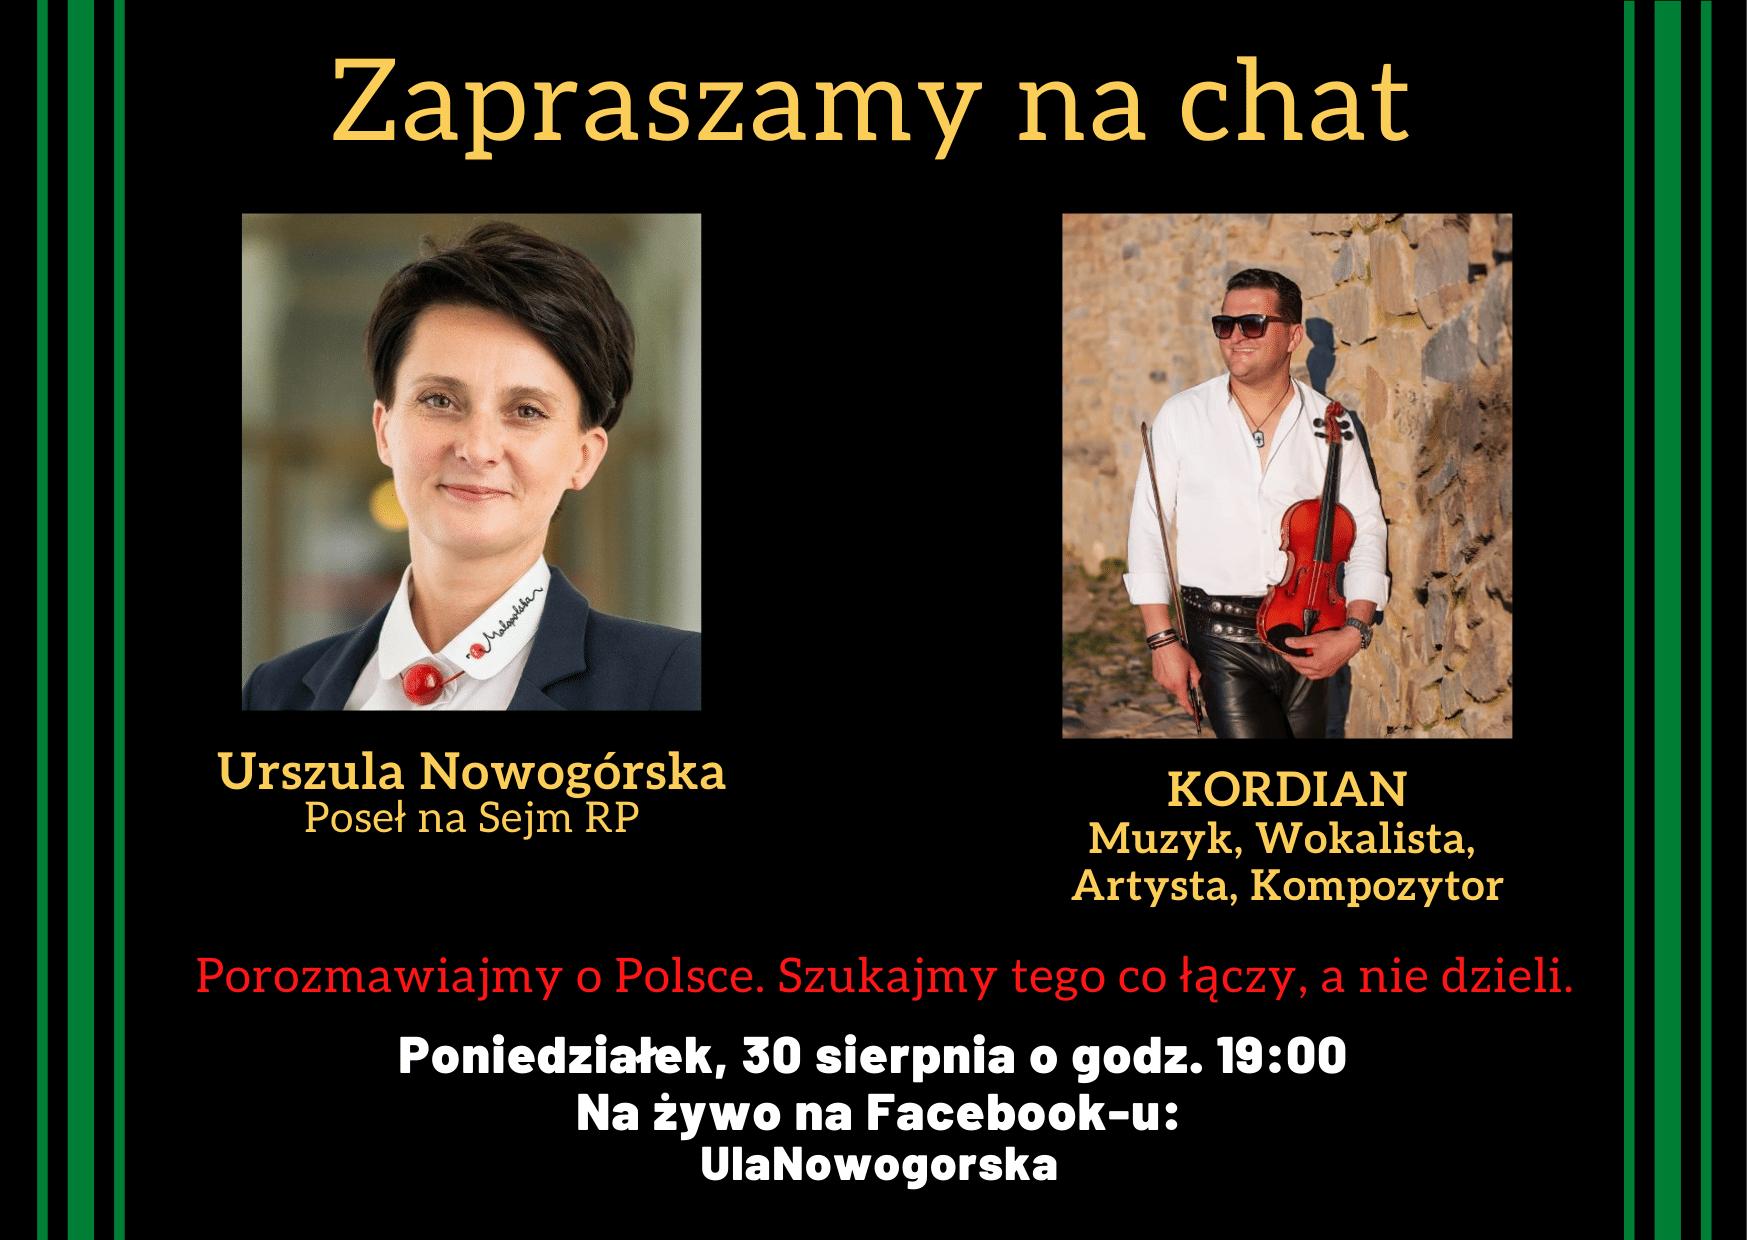 Urszula Nowogórska